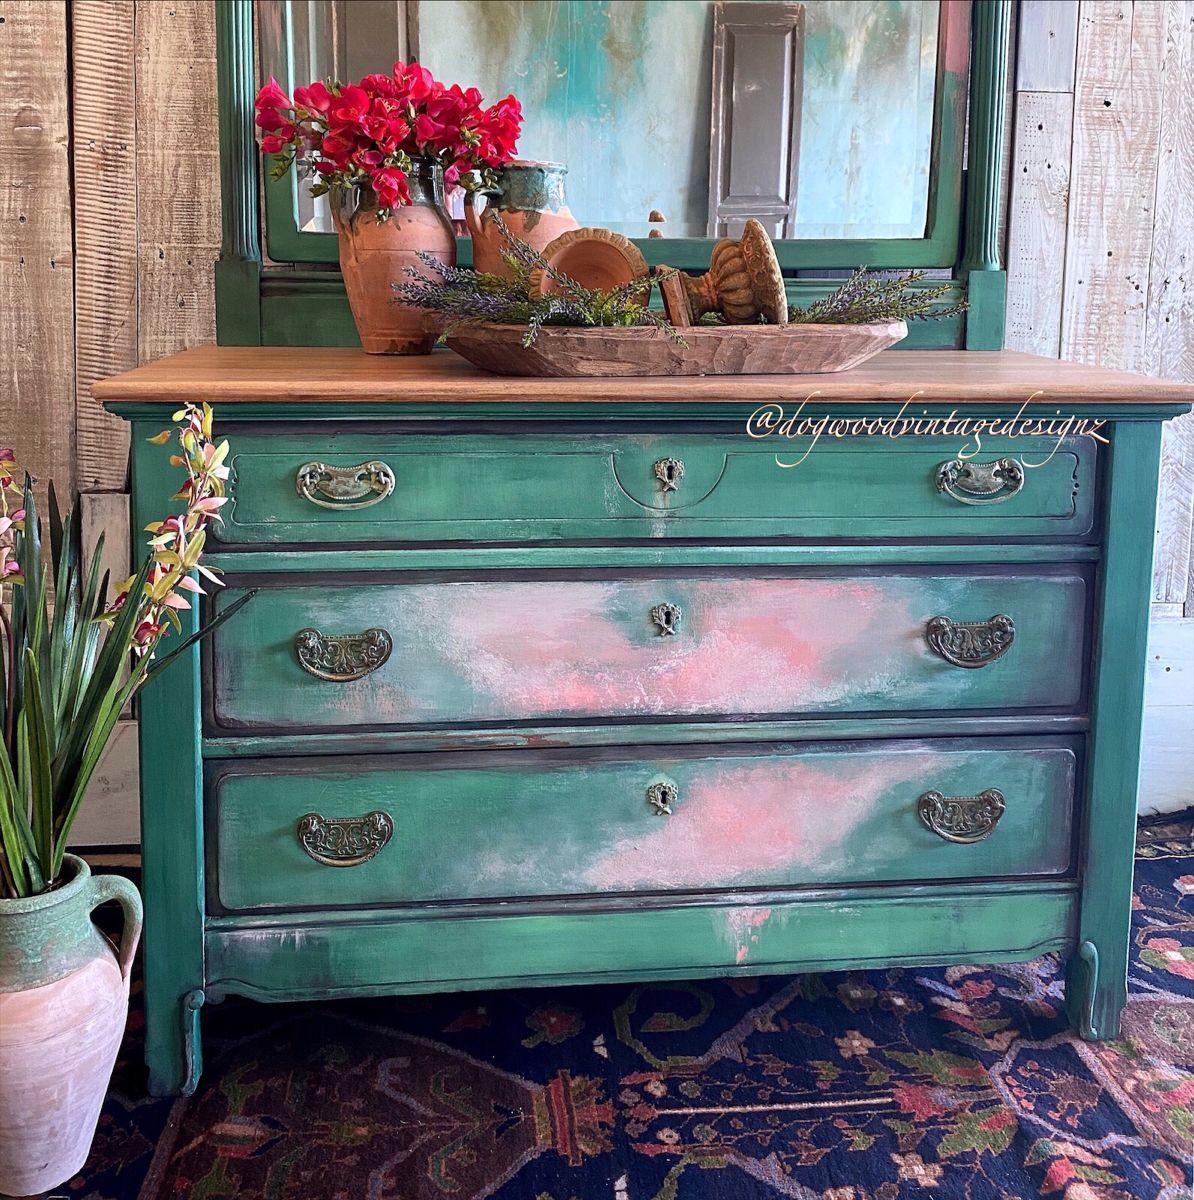 #paintedfurniture #furnitureartist #layeredpaint #antique #bohostyle #diyhomedecor #colormovement #cottagestyle #modernfarmhouse #upcycle #debisdesigndiary #diypaint #textured #wallart #peelingpaint #patina #transfers #timeless